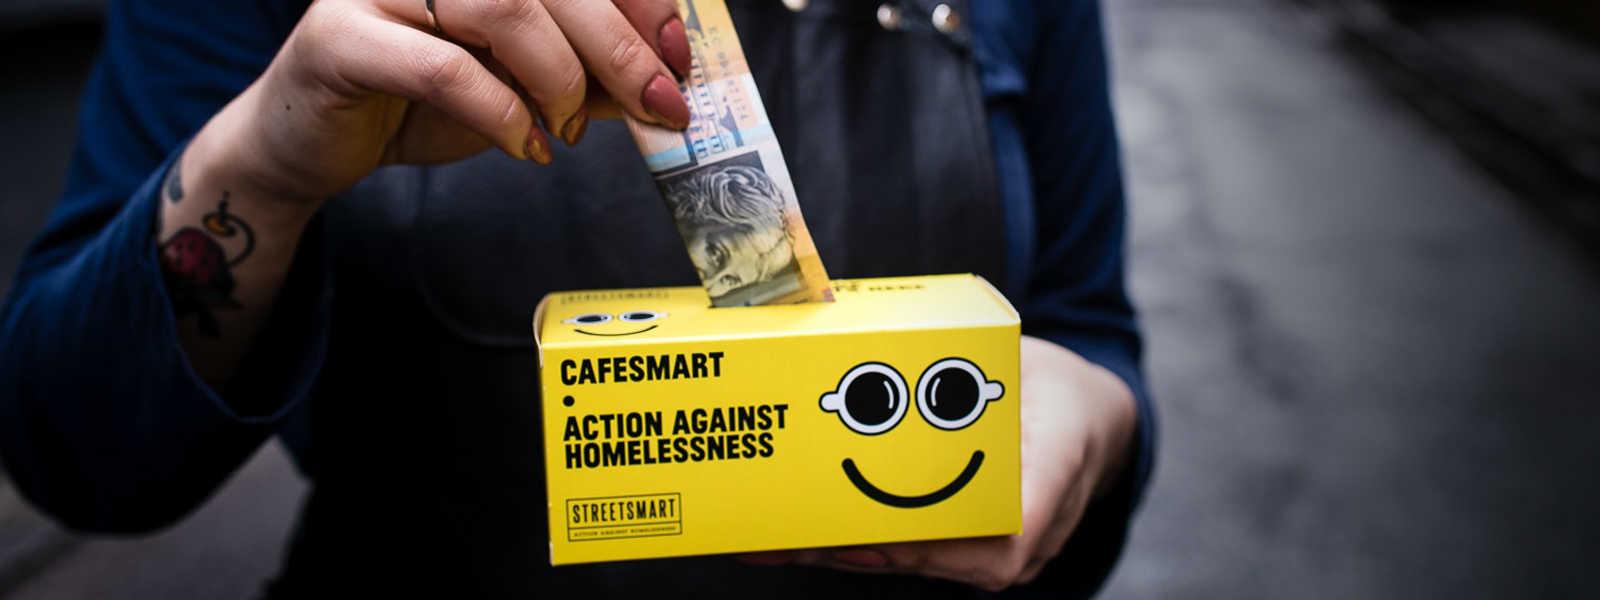 image via CafeSmart by StreetSmart